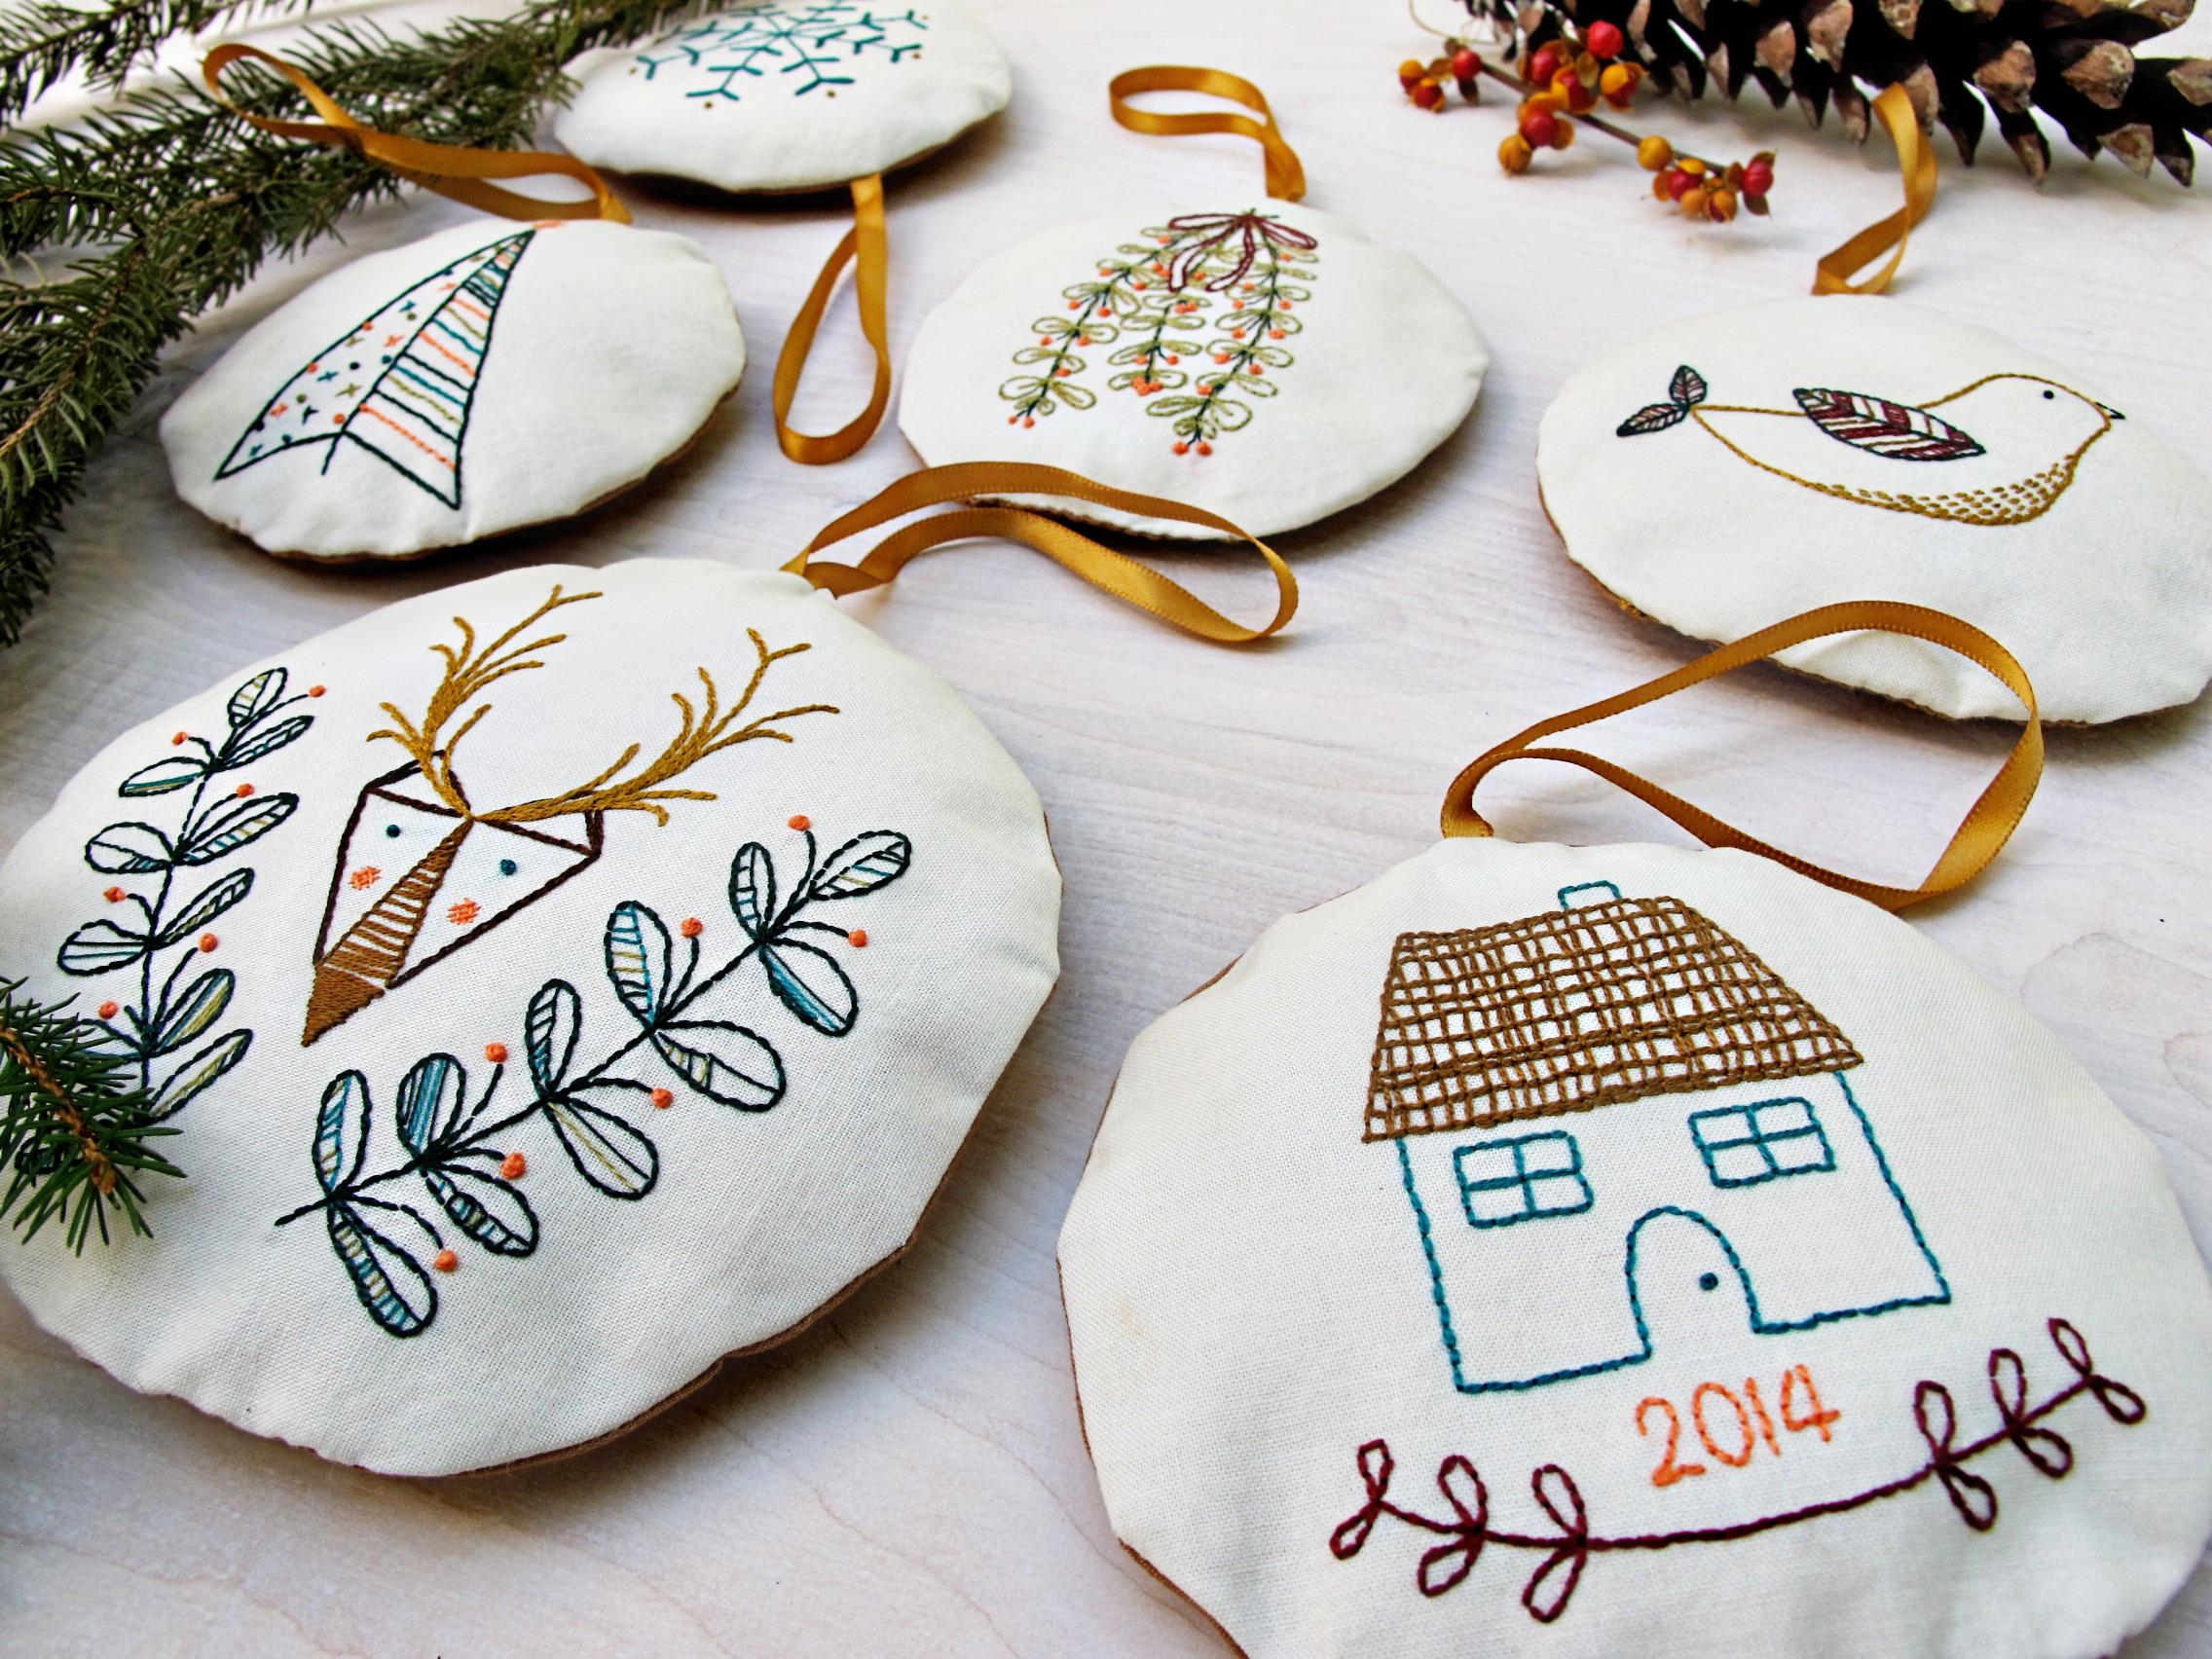 2014 holiday ornaments